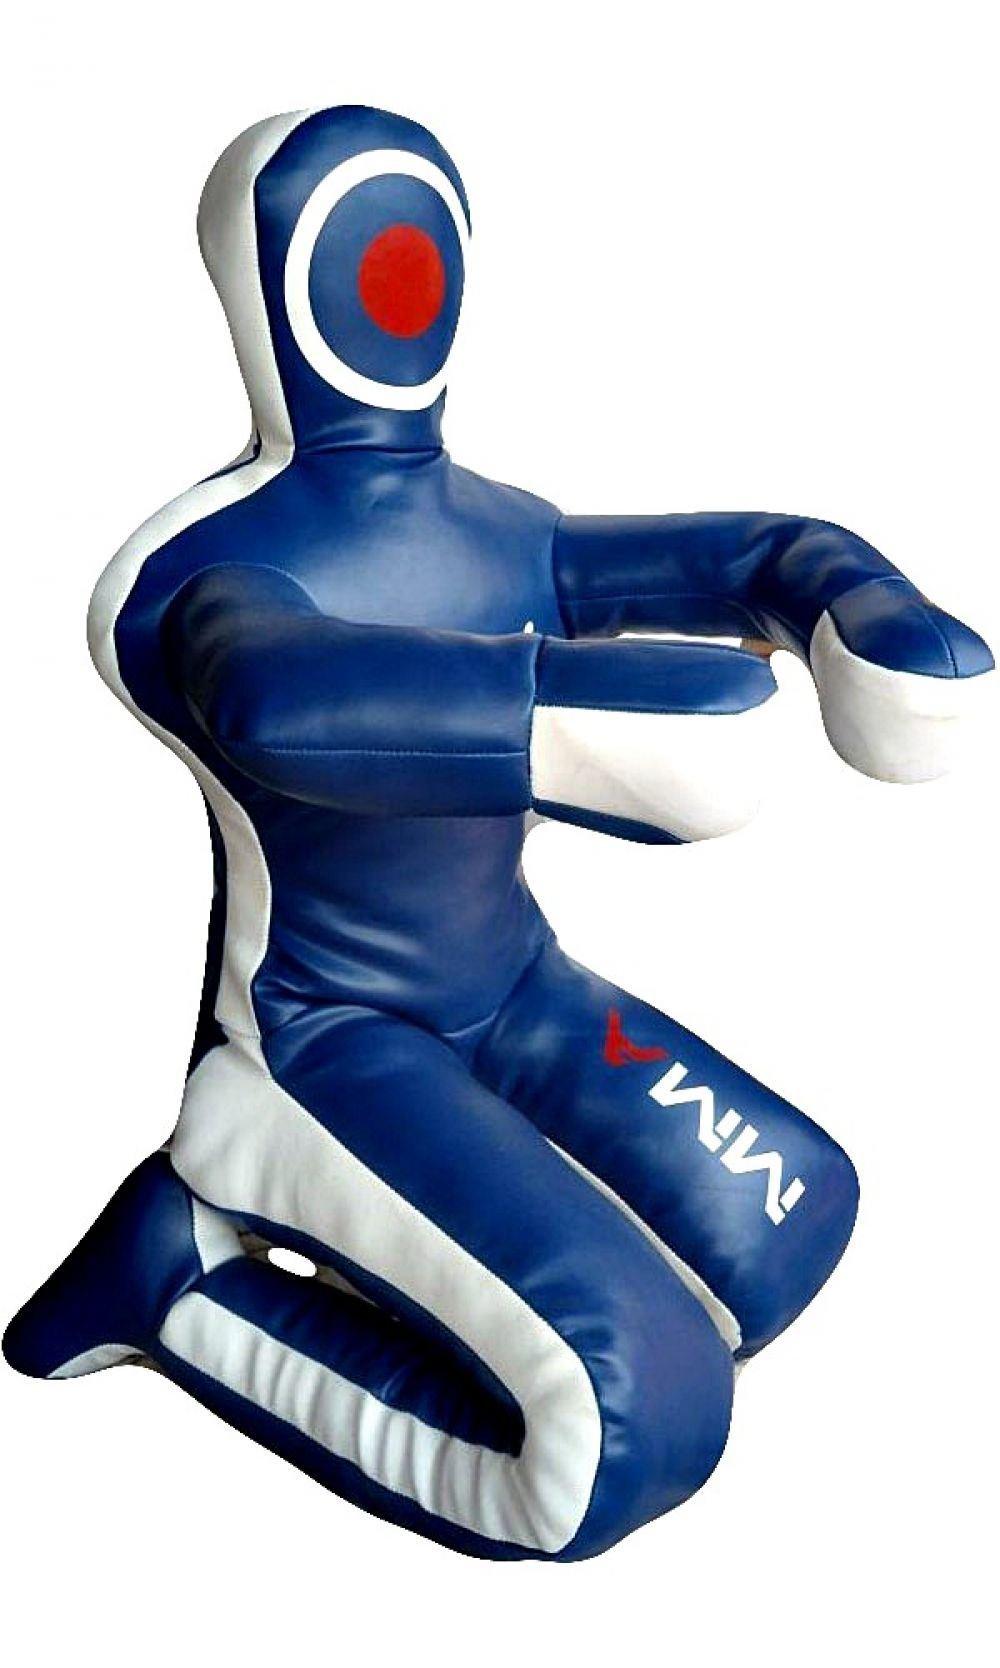 Celebrita MMA Judo Punching Bag Grappling Dummy unfilled - Sitting Position hands front MMA382 Leather - Blue 59'' Up to 45kg/99 lb